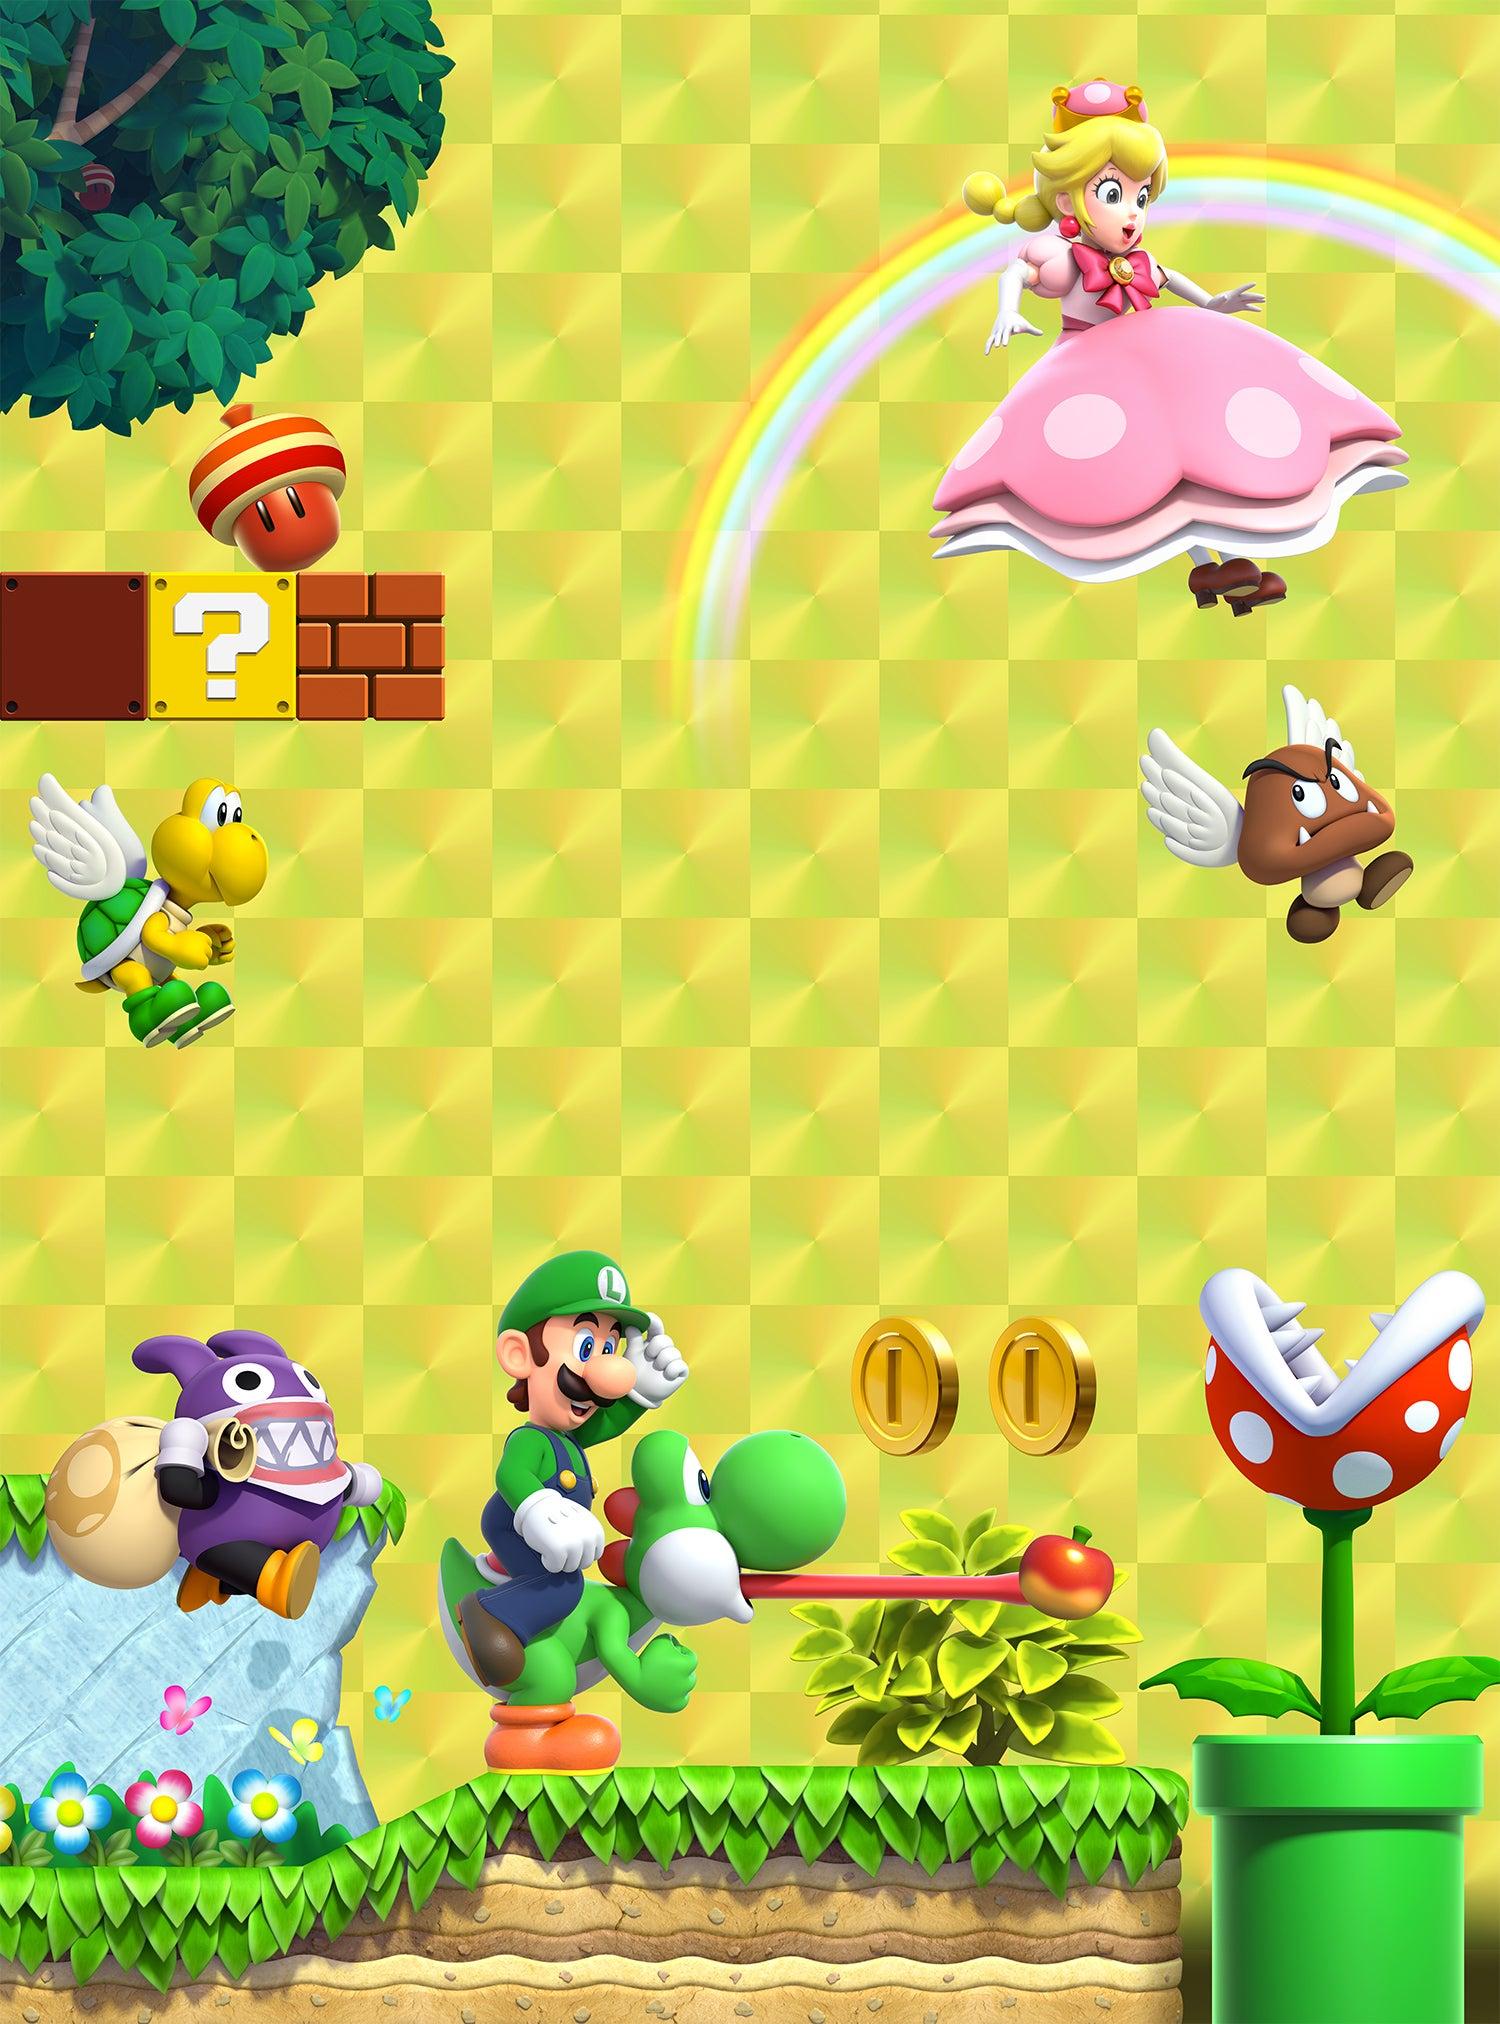 New 超級瑪利歐兄弟U 豪華版|Nintendo Switch|Nintendo